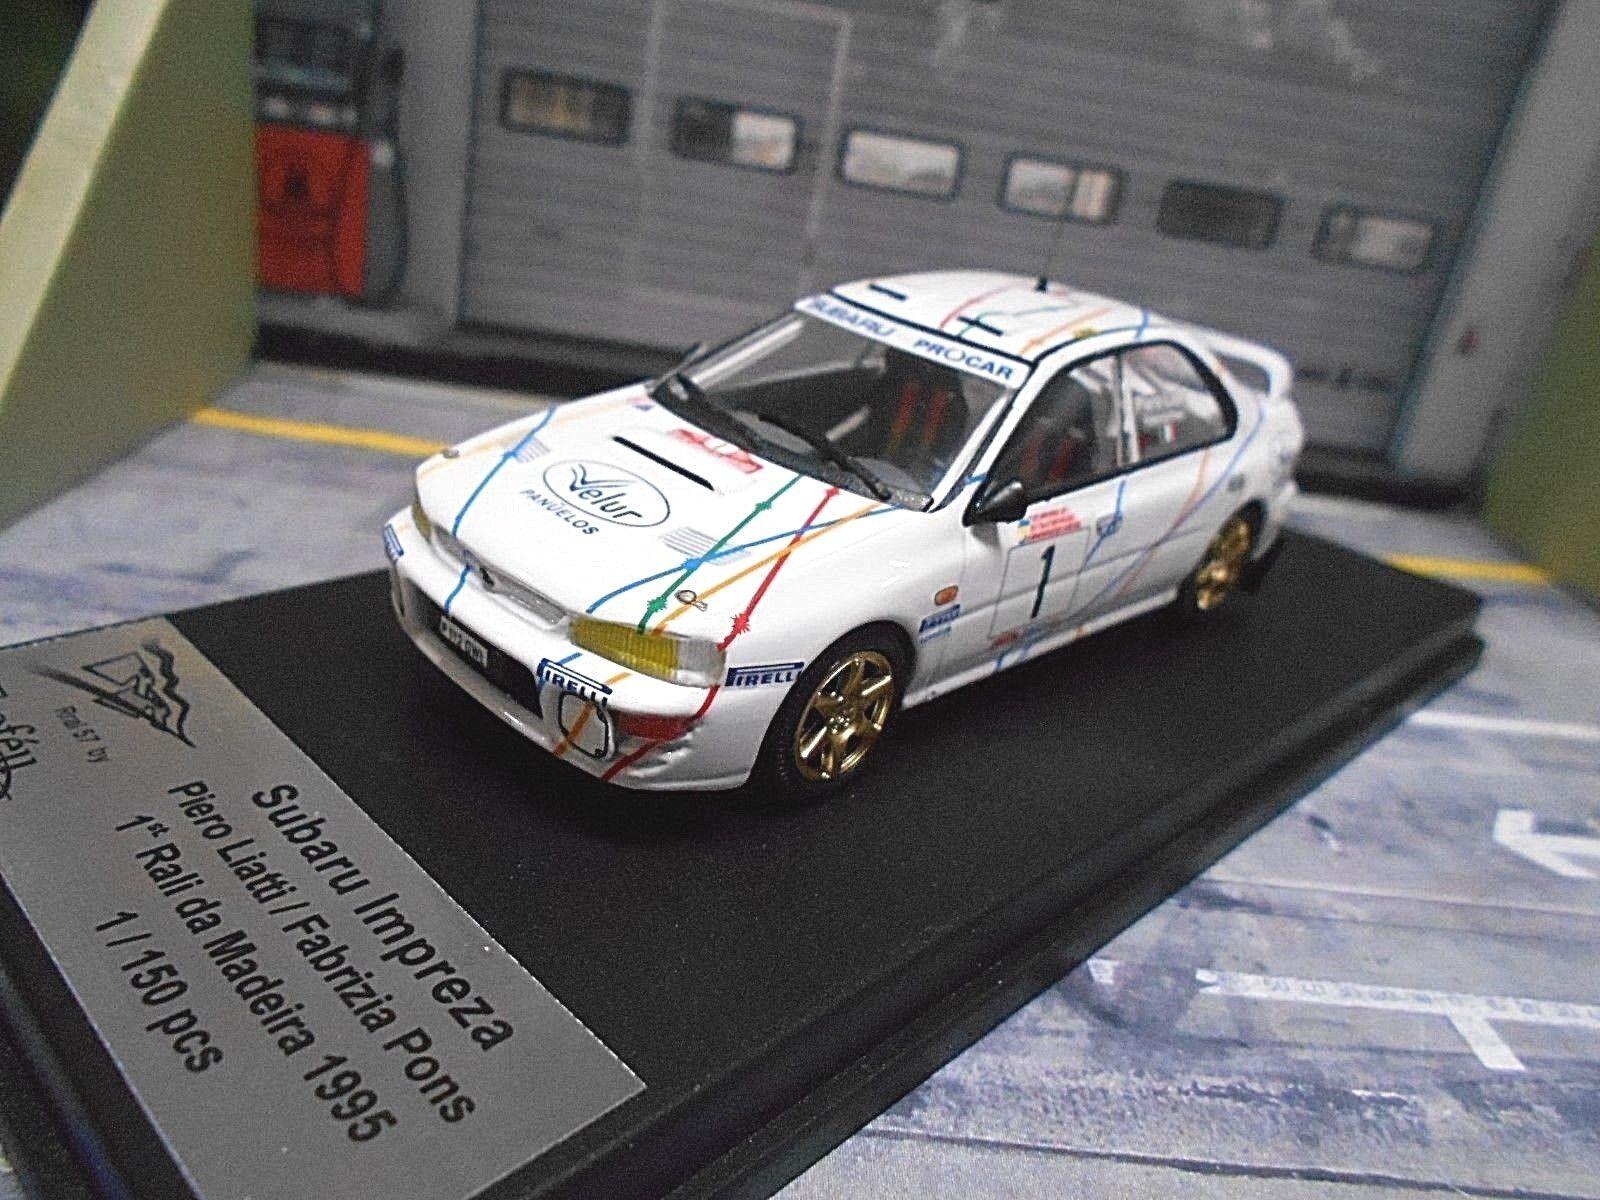 Subaru Impreza WRC Rally de Madeira 1995 winner  1 liatti Pons velur Trofeu 1 43